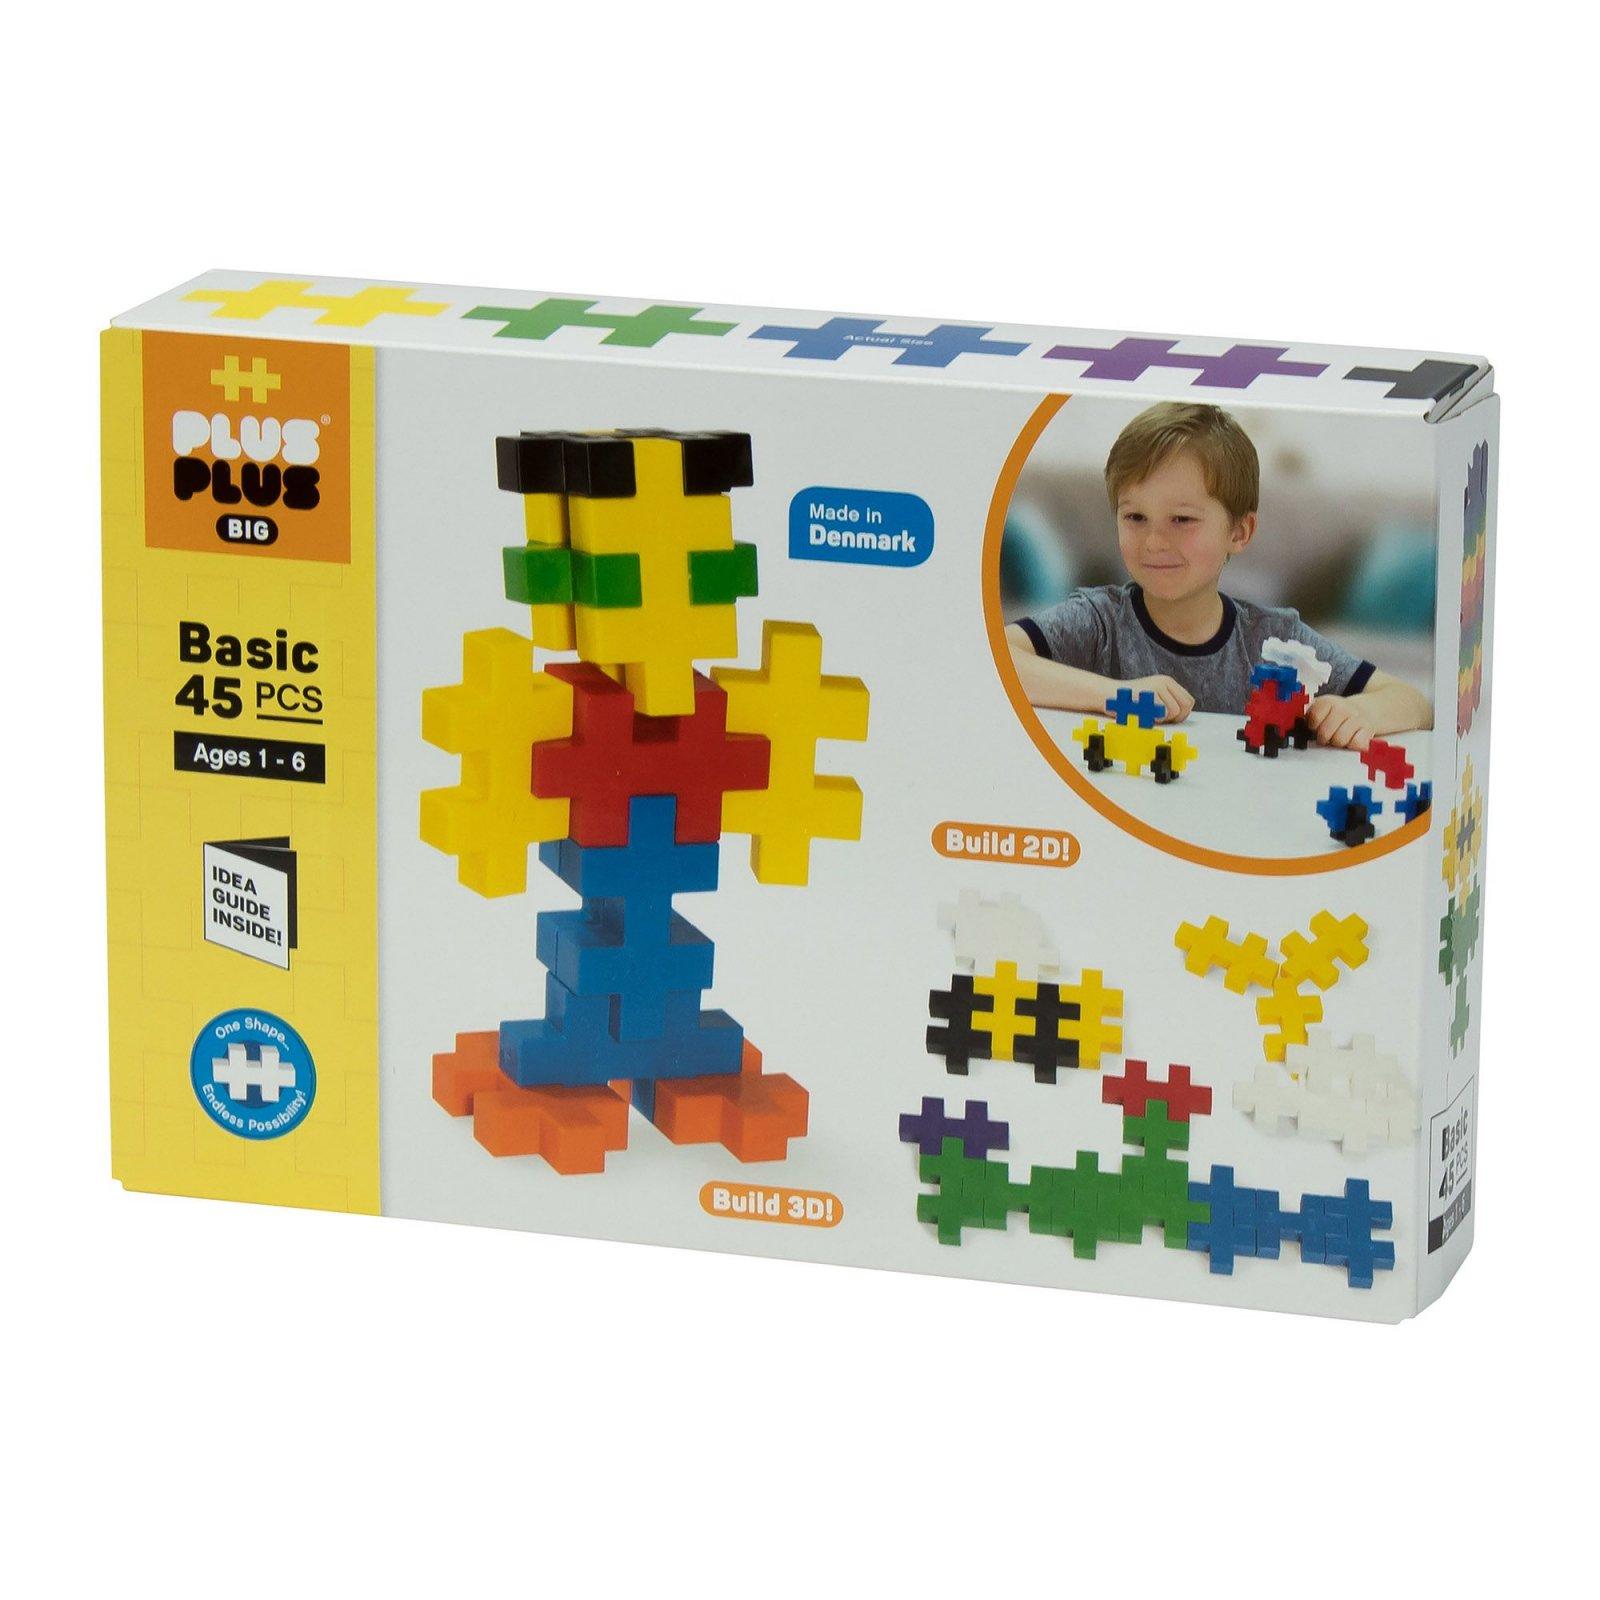 Basic 45 Piece Set Big by Plus Plus